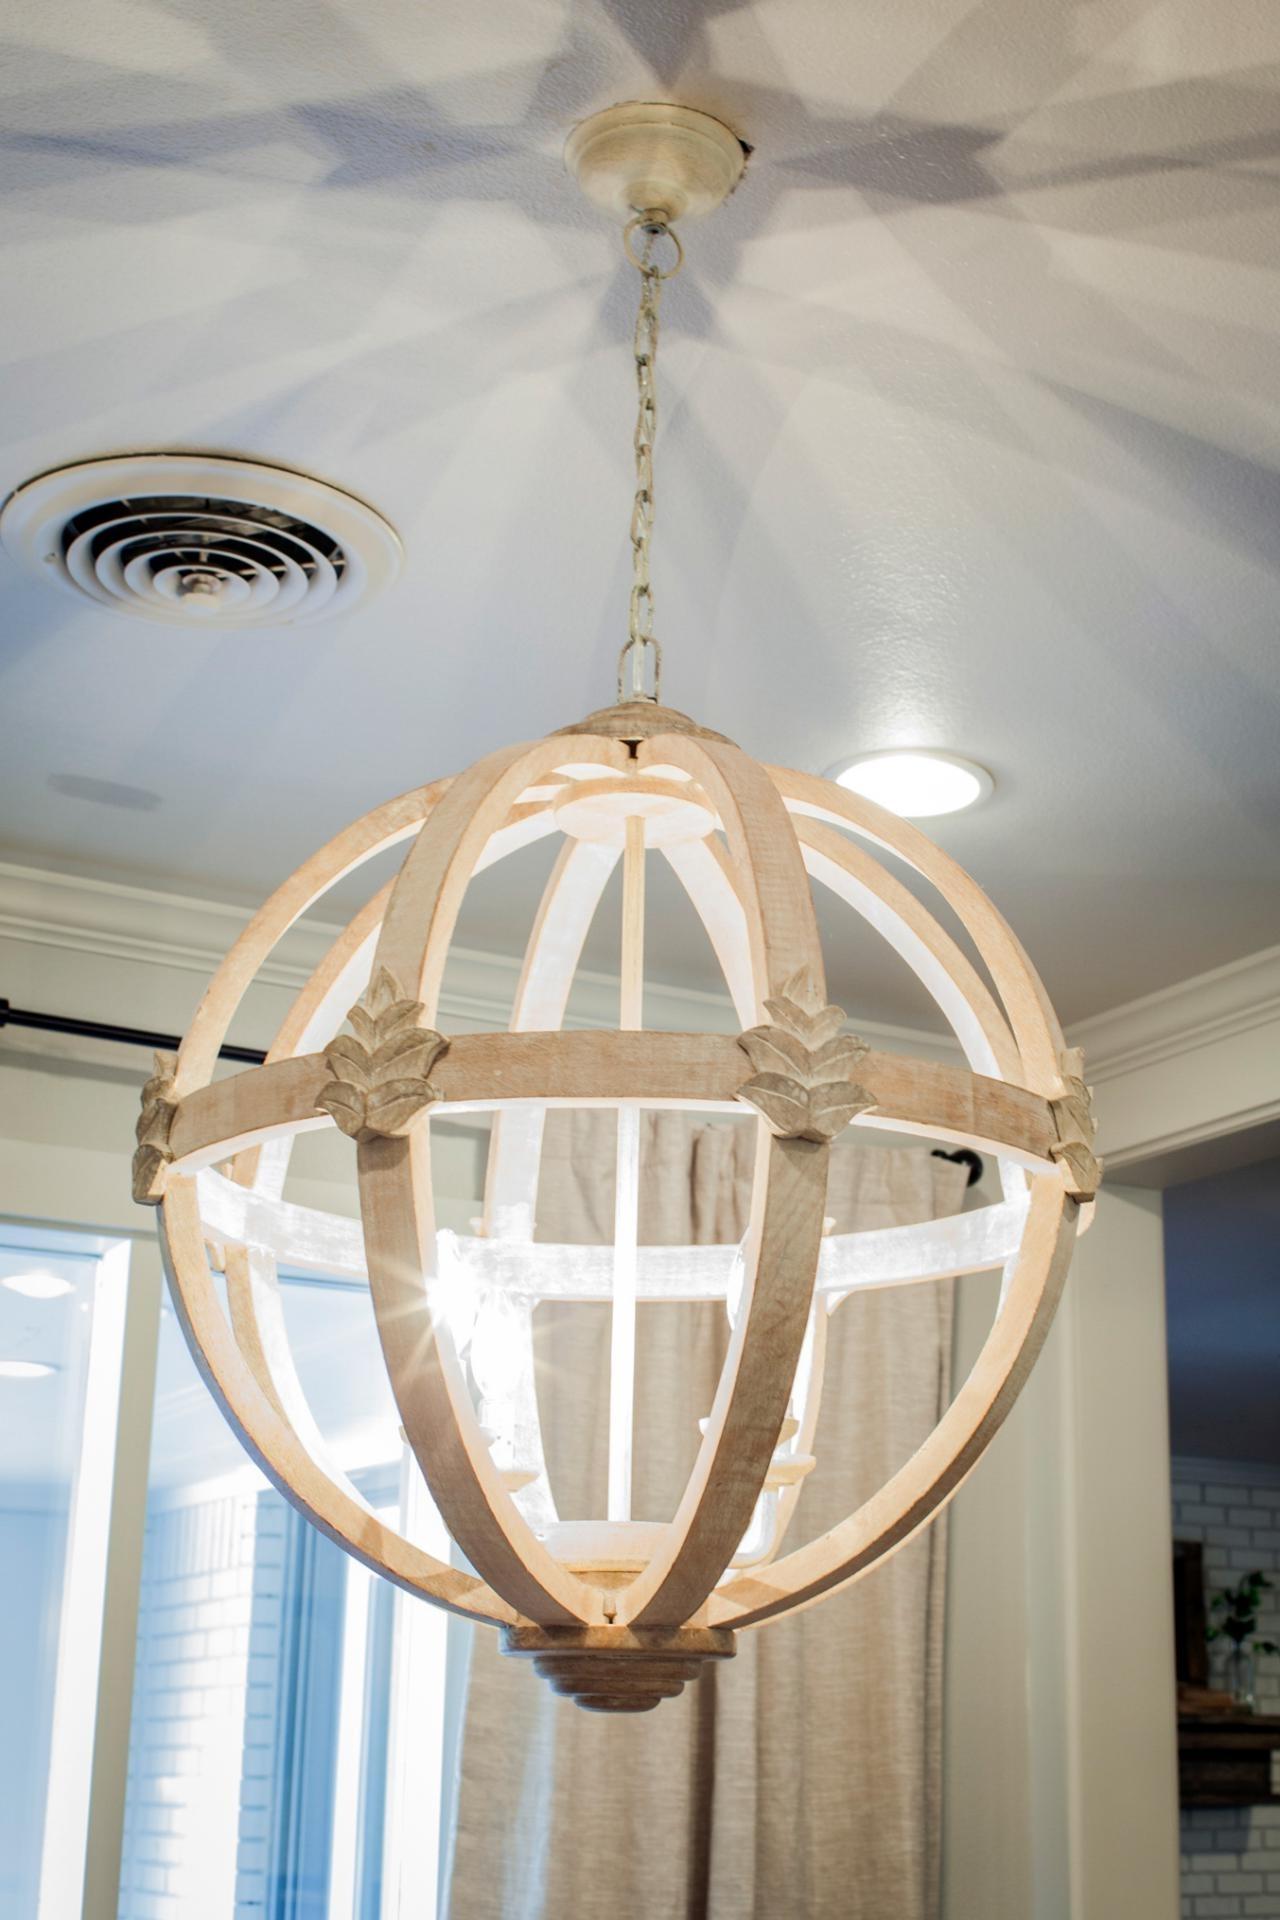 Wooden Chandeliers Regarding 2019 Lighting: Sophisticated Wooden Chandeliers For Home Accessories (View 19 of 20)